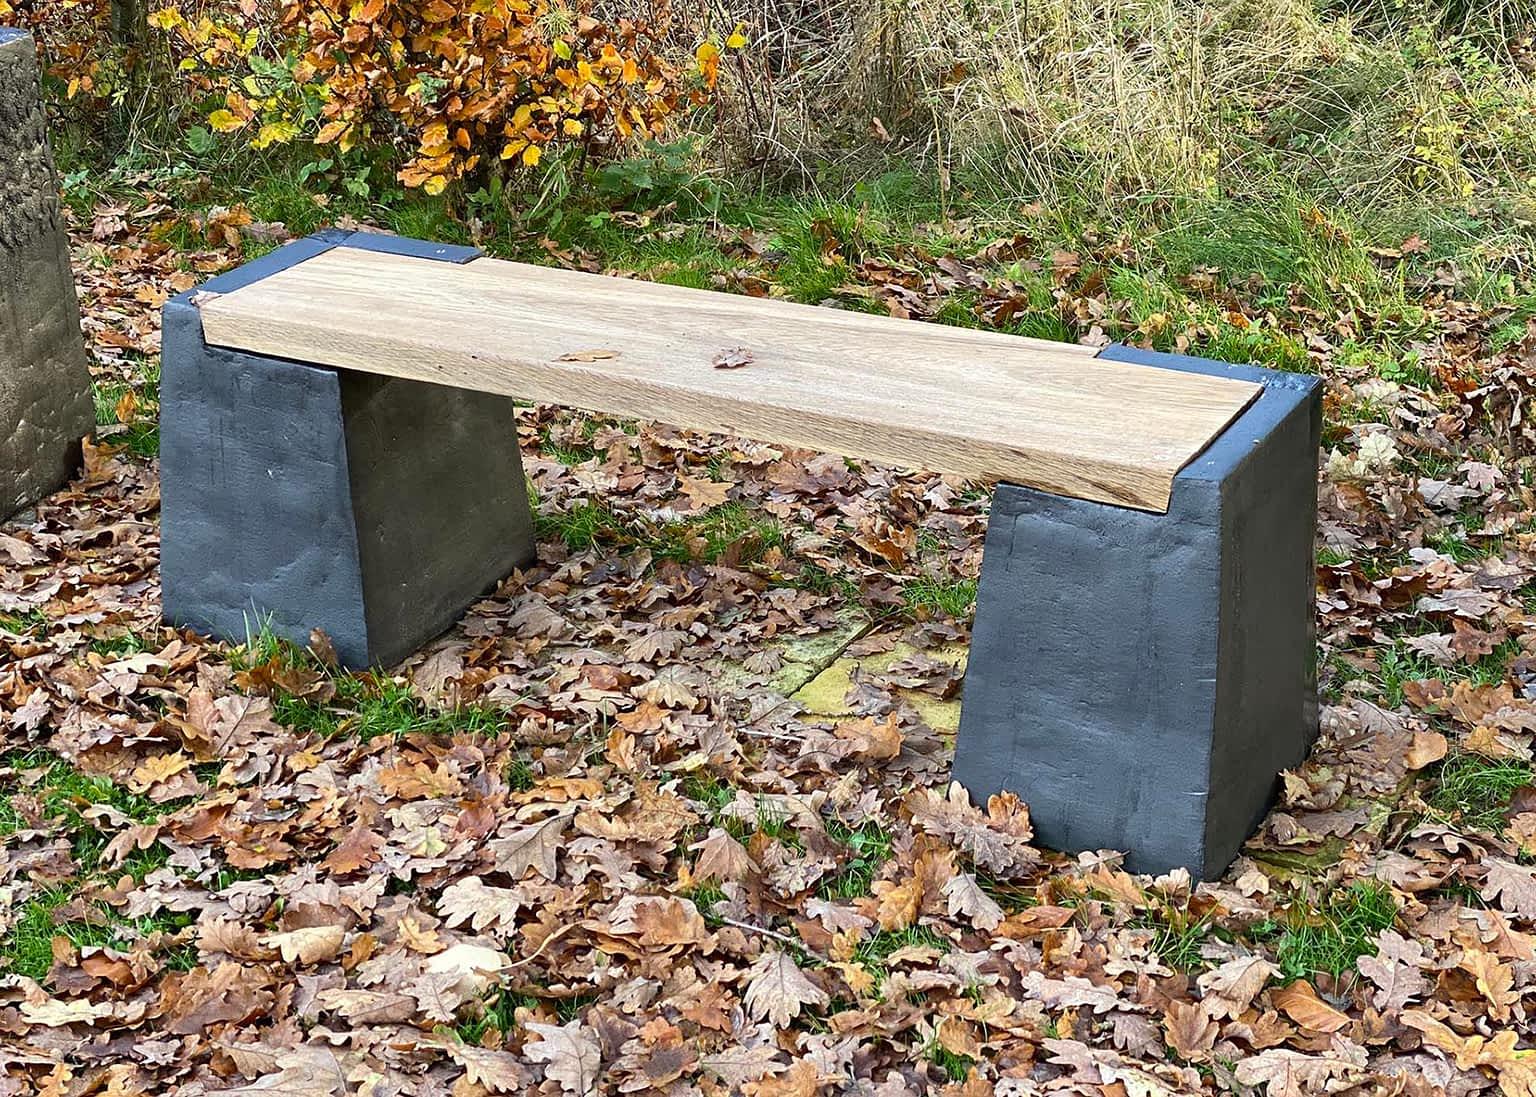 Clay-bench-engholm-michelsen-sculpture-lav-stentoejs-baenk